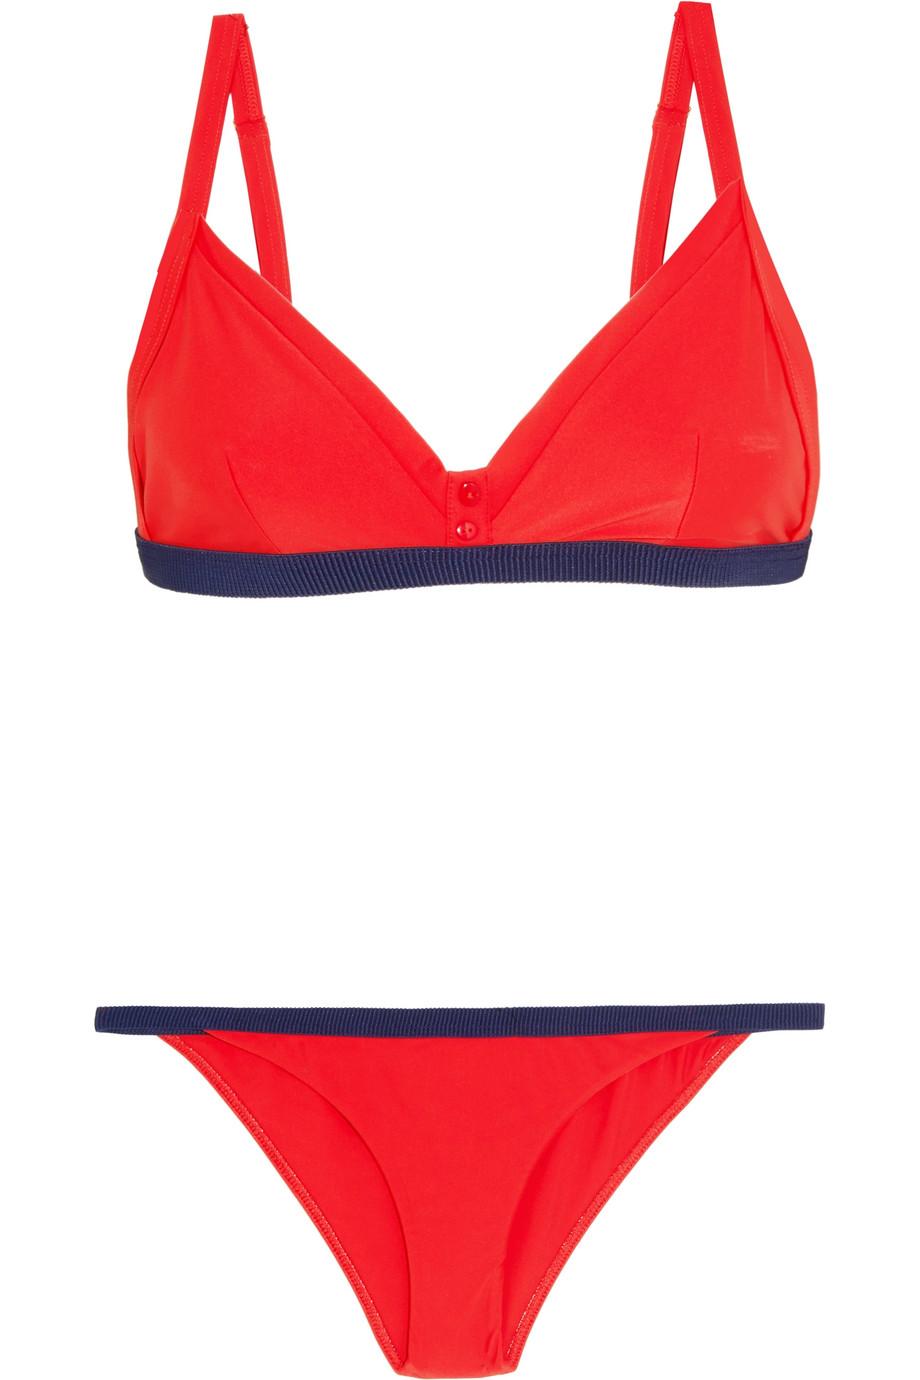 Rye | Zesty grosgrain-trimmed triangle bikini | NET-A-PORTER.COM